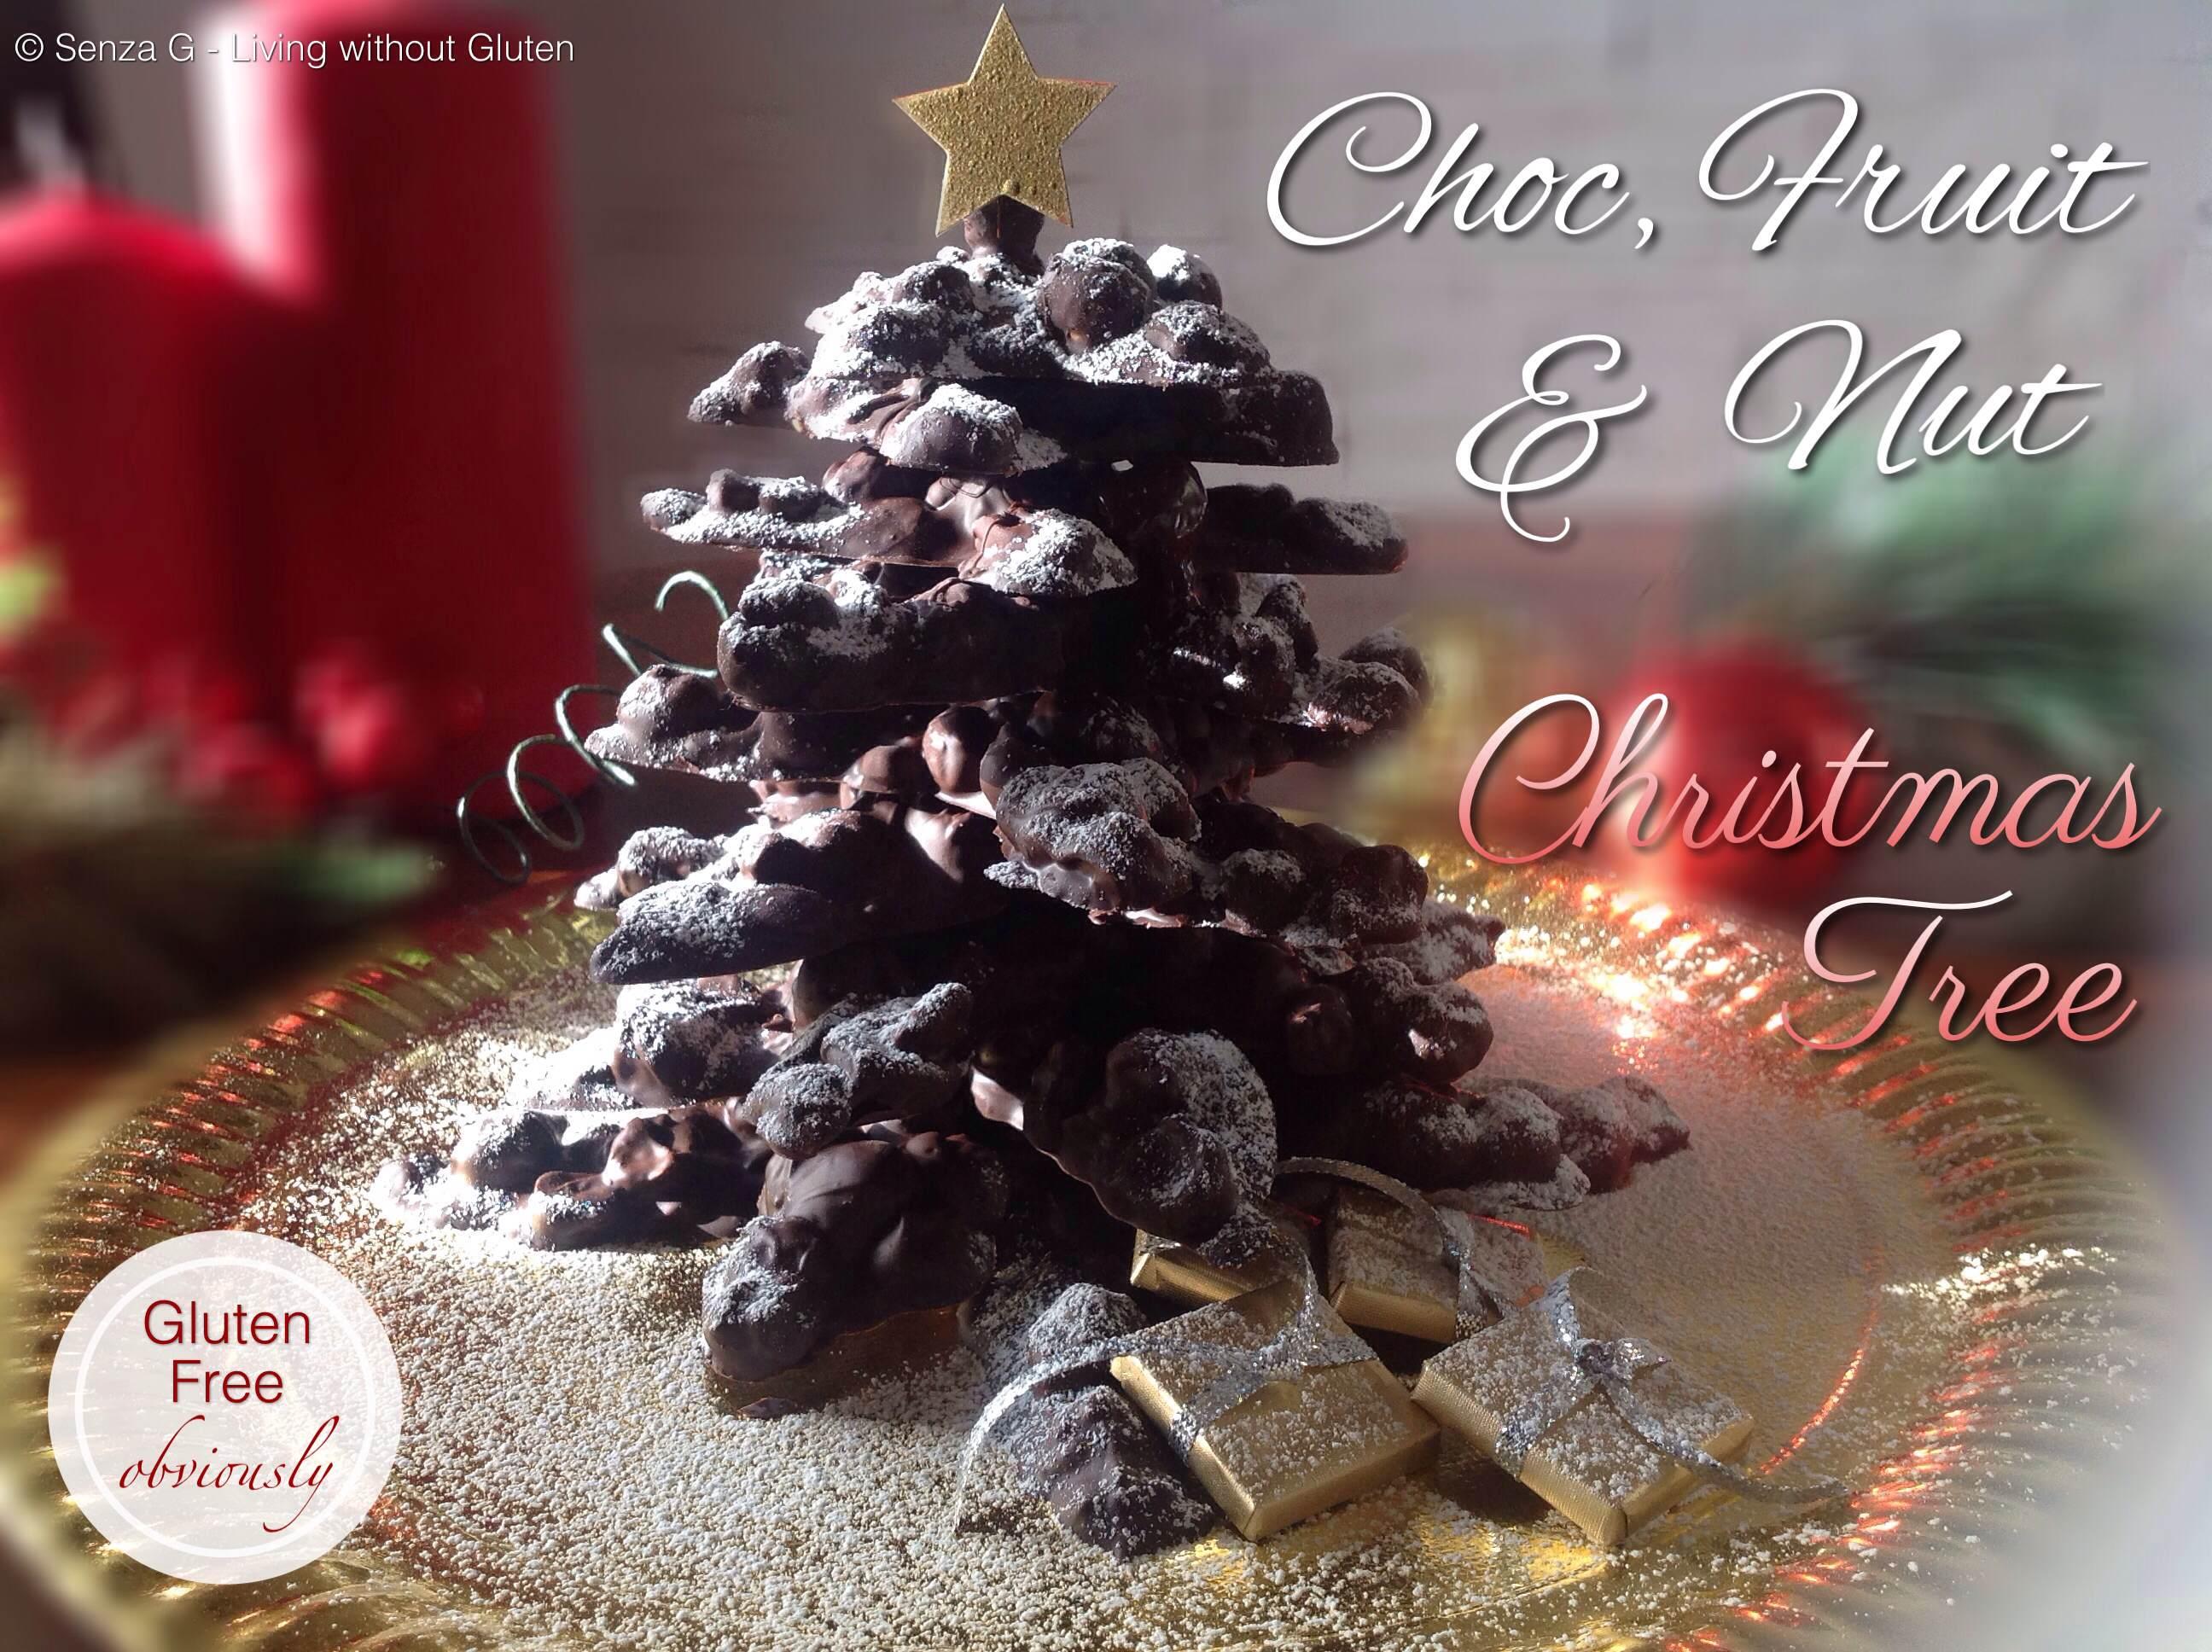 90s Christmas Tree.Chocolate Christmas Tree Senza G